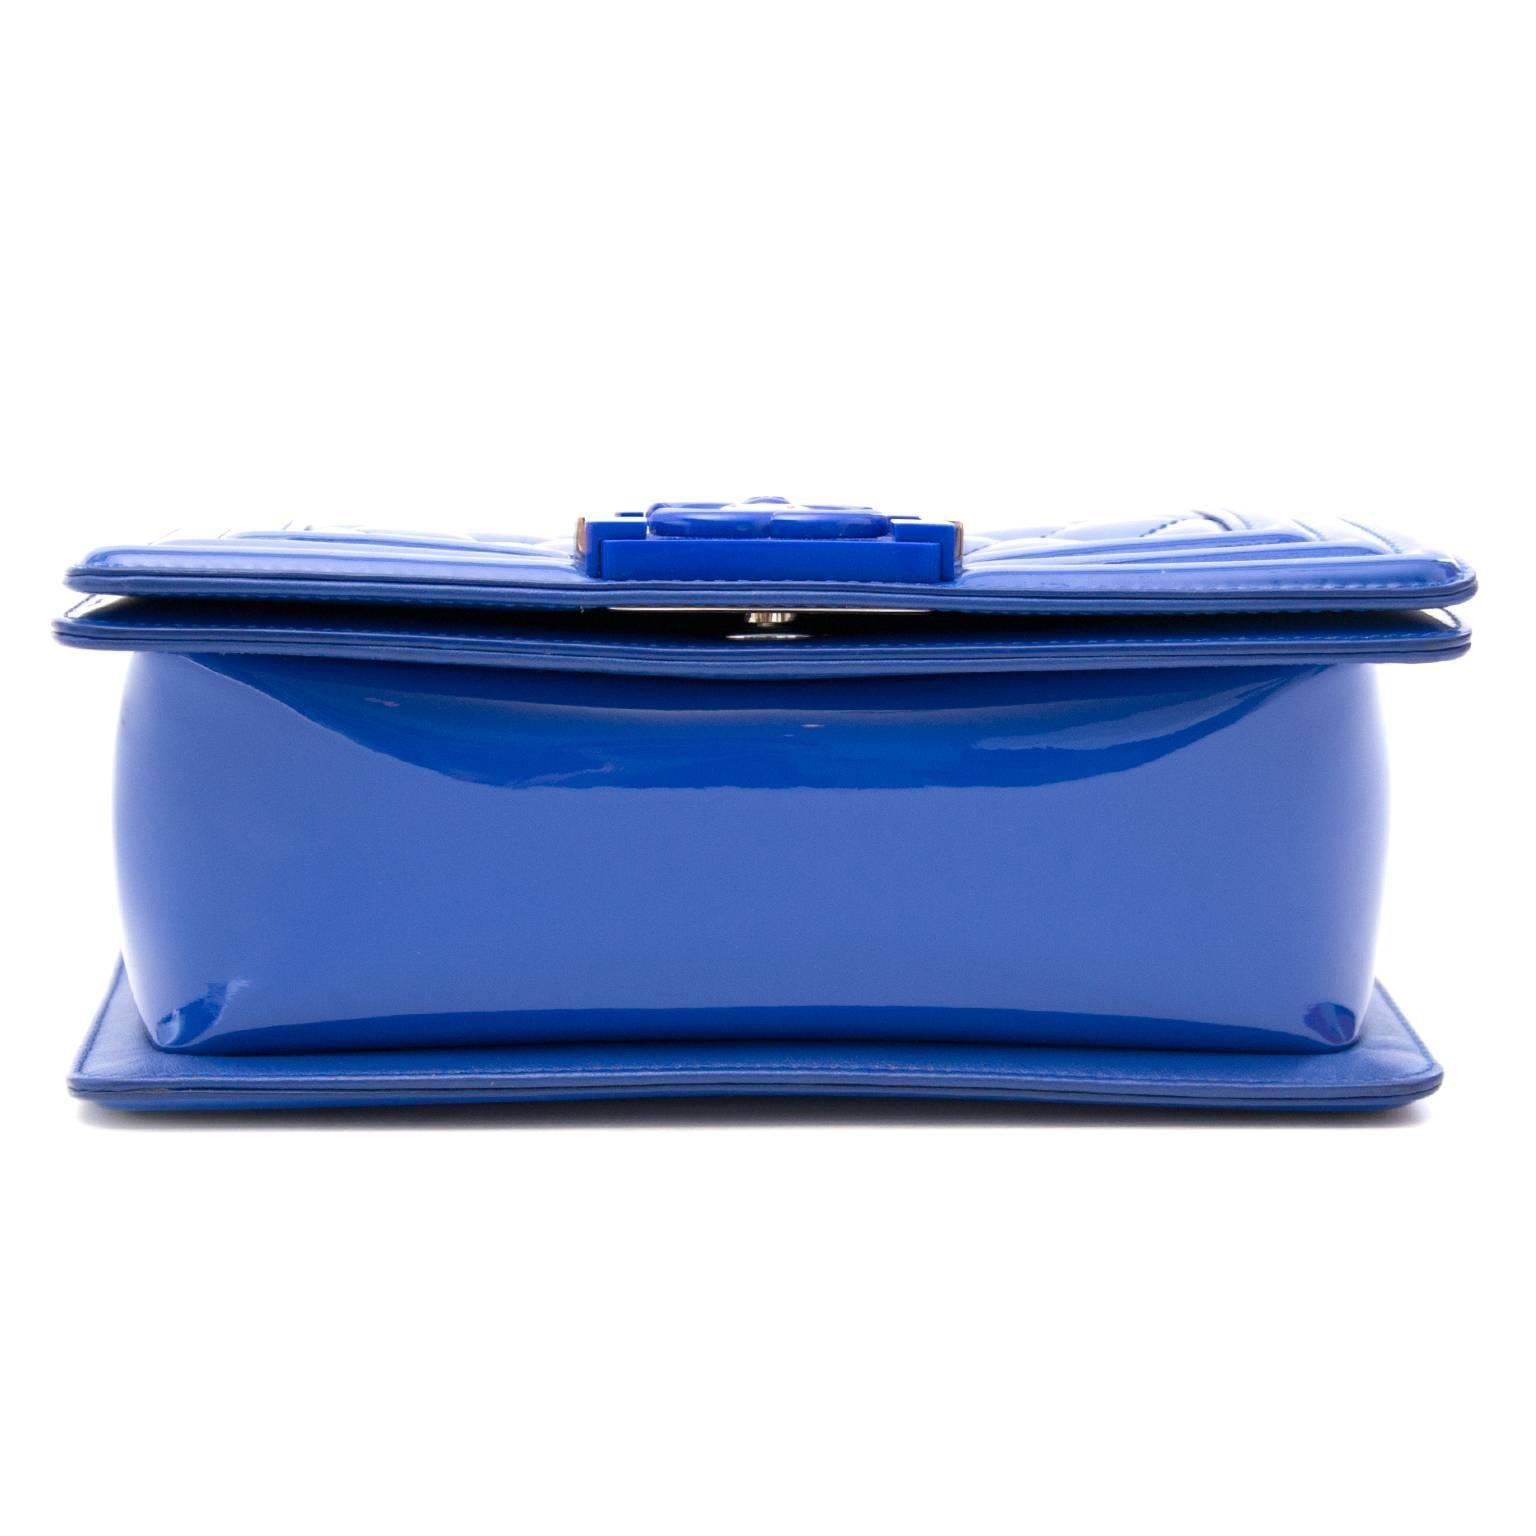 487622031e2b Chanel Patent Petrol Blue Boy Bag with Plexiglass CC Boy Clasp at 1stdibs